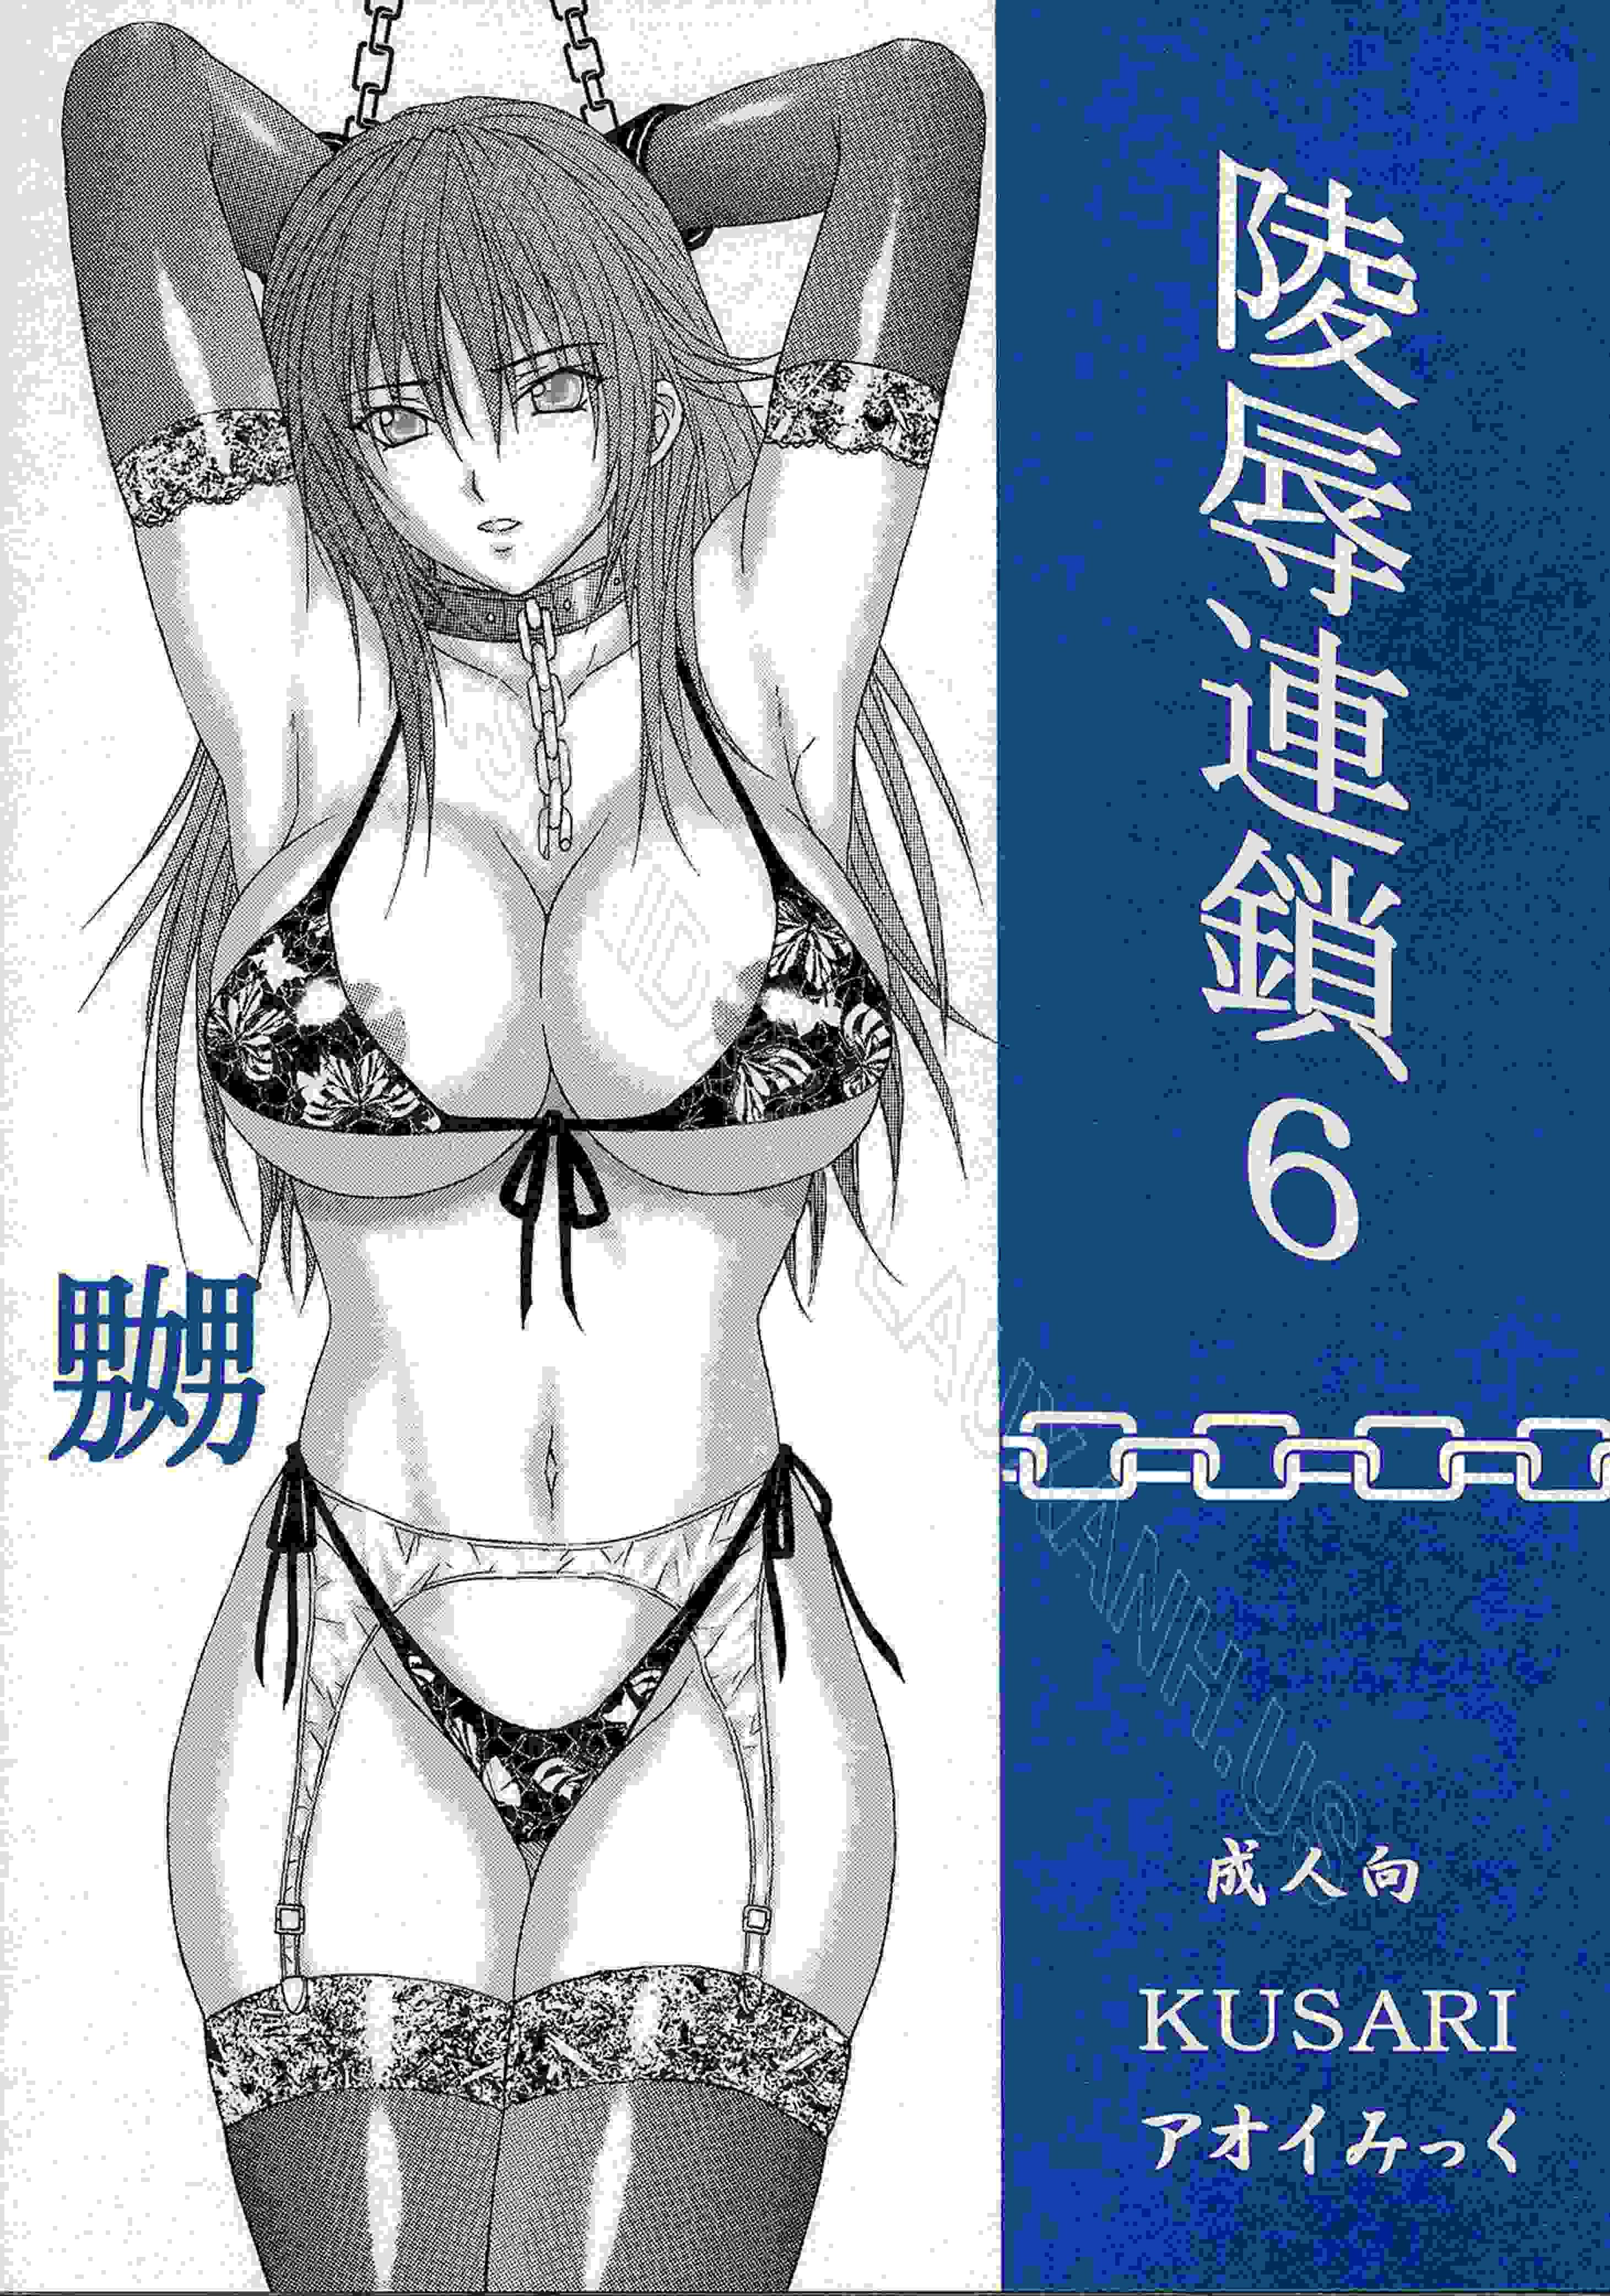 TruyenHay.Com - Ảnh 33 - Ryoujoku Rensa Chapter 6